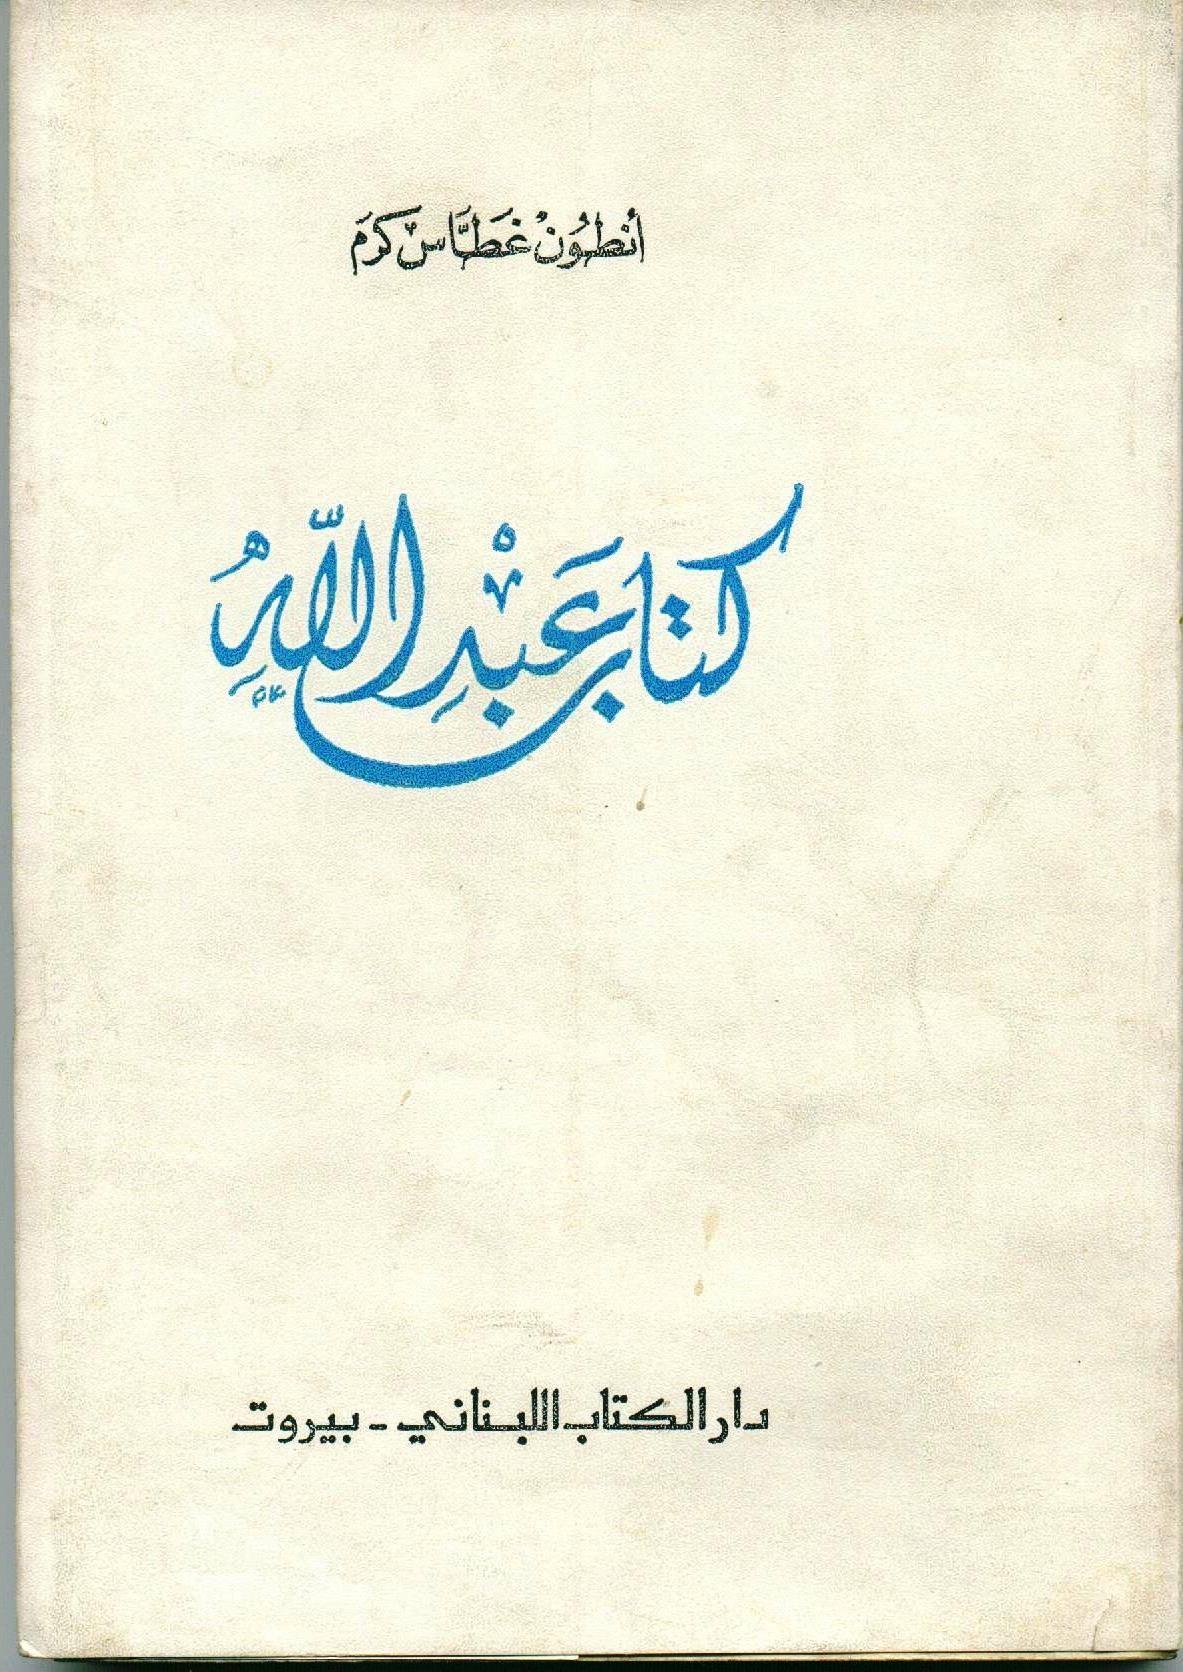 كتاب عبدالله